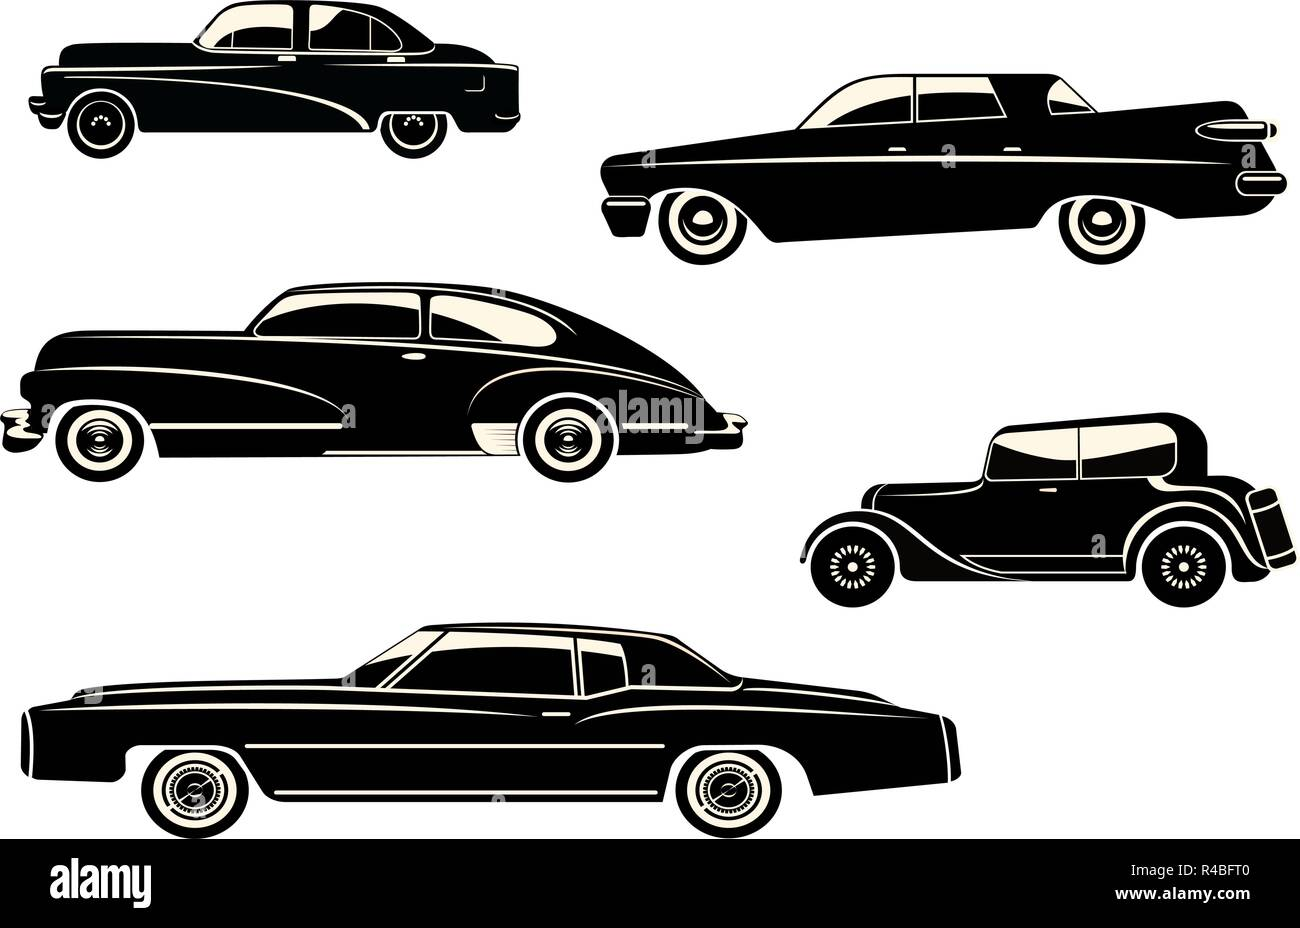 Vector Illustration With Black Retro Car Silhouette Stock Vector Art